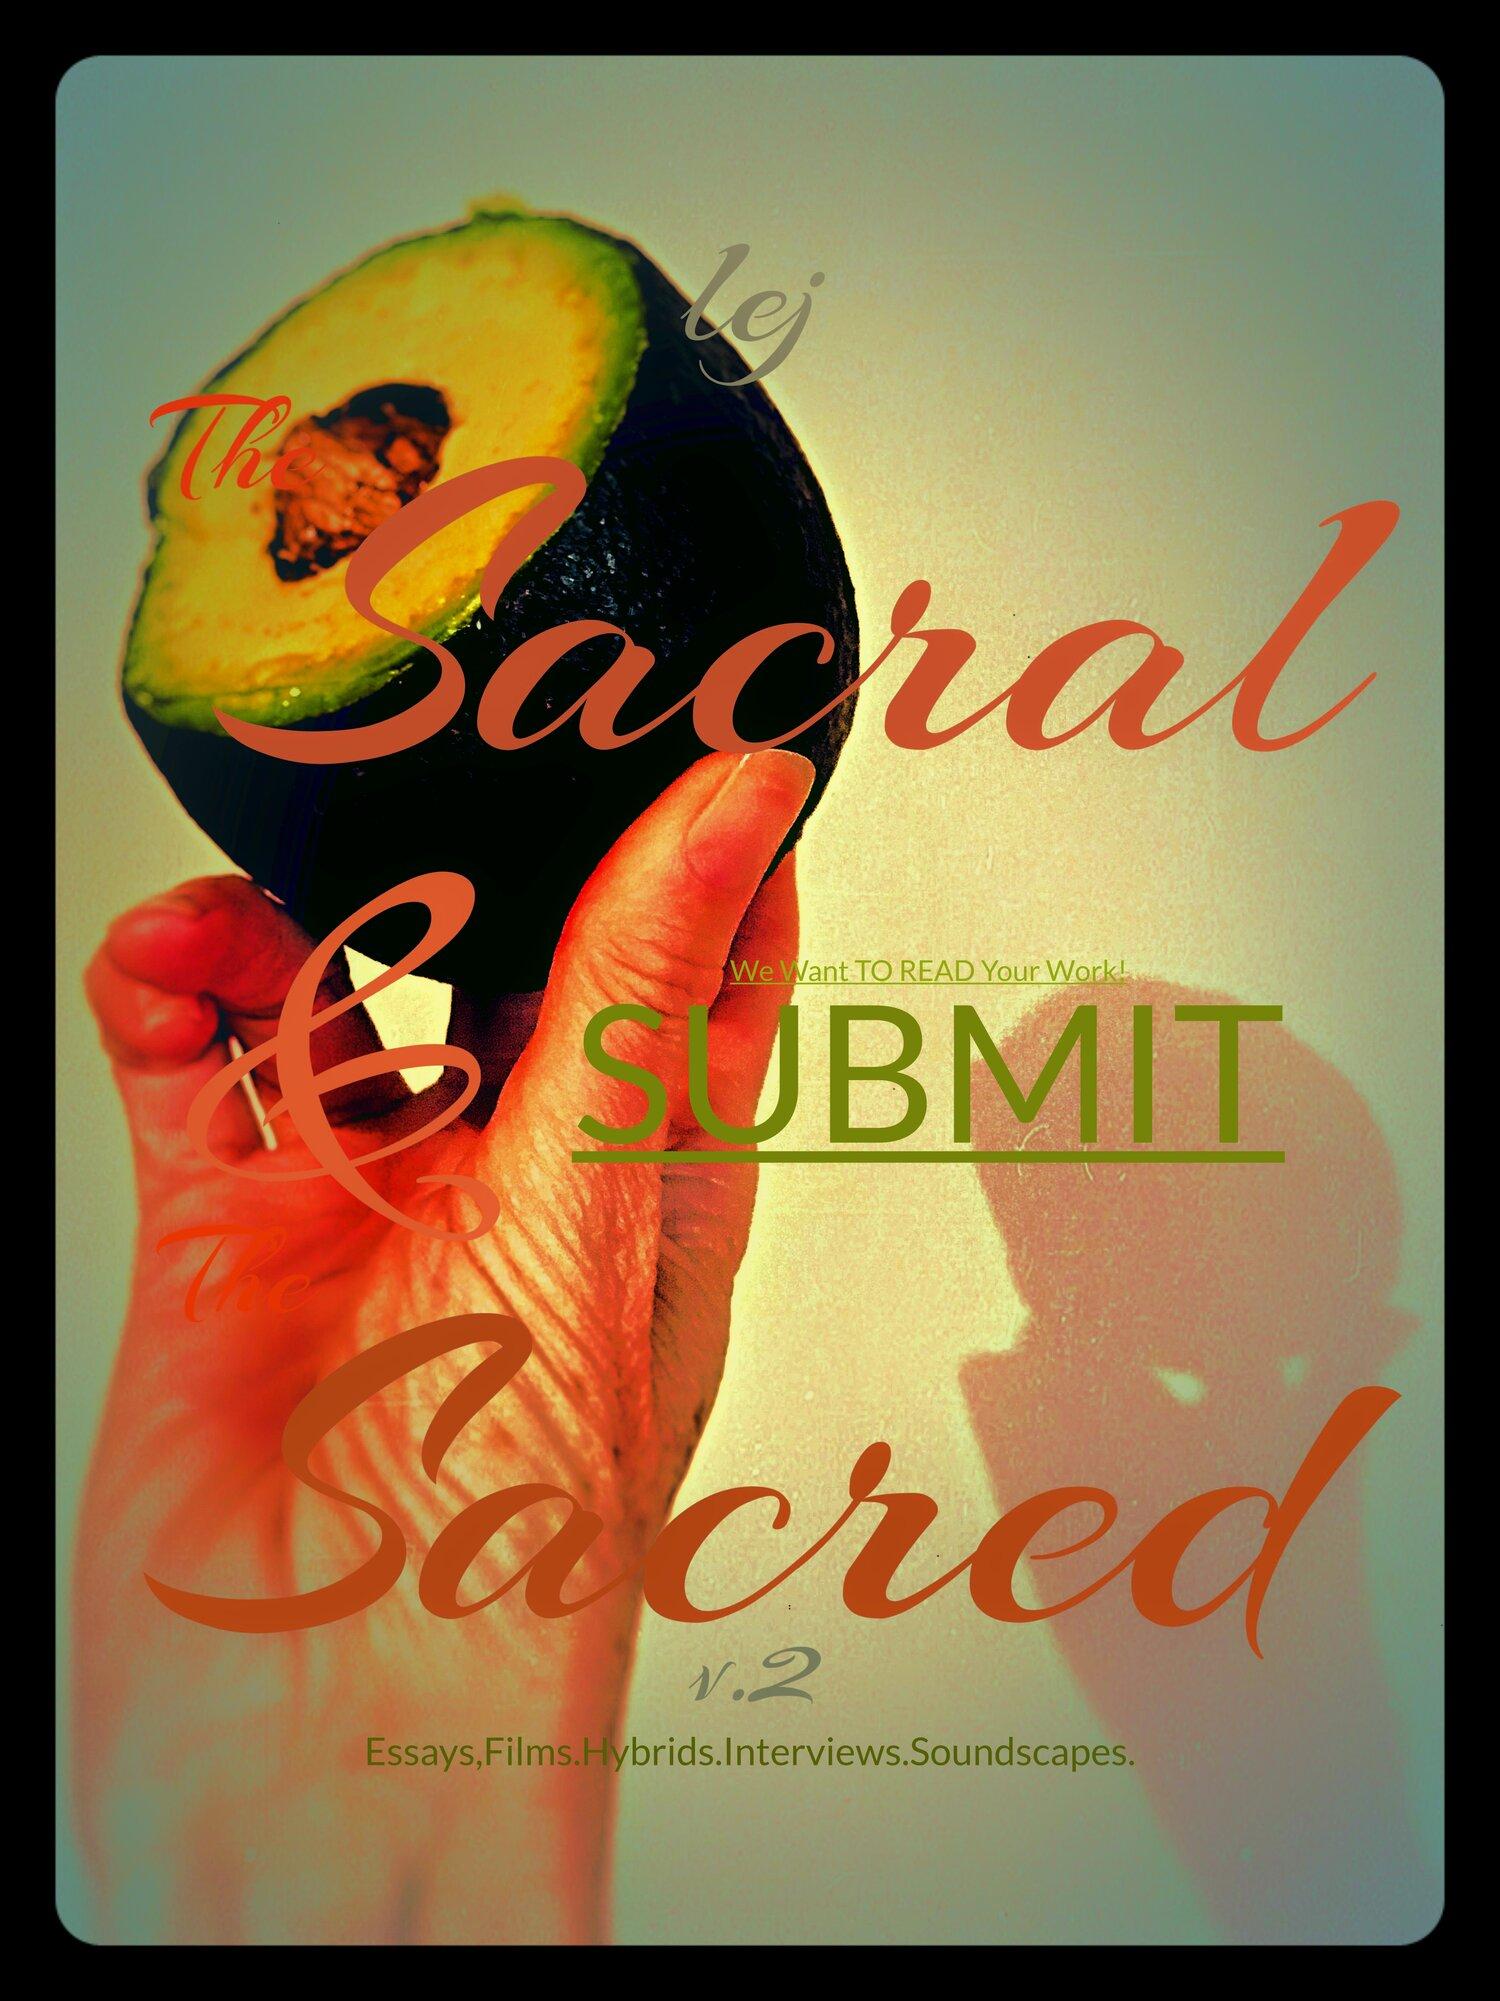 Upcoming: LEJv.002 The Sacral & The Sacred